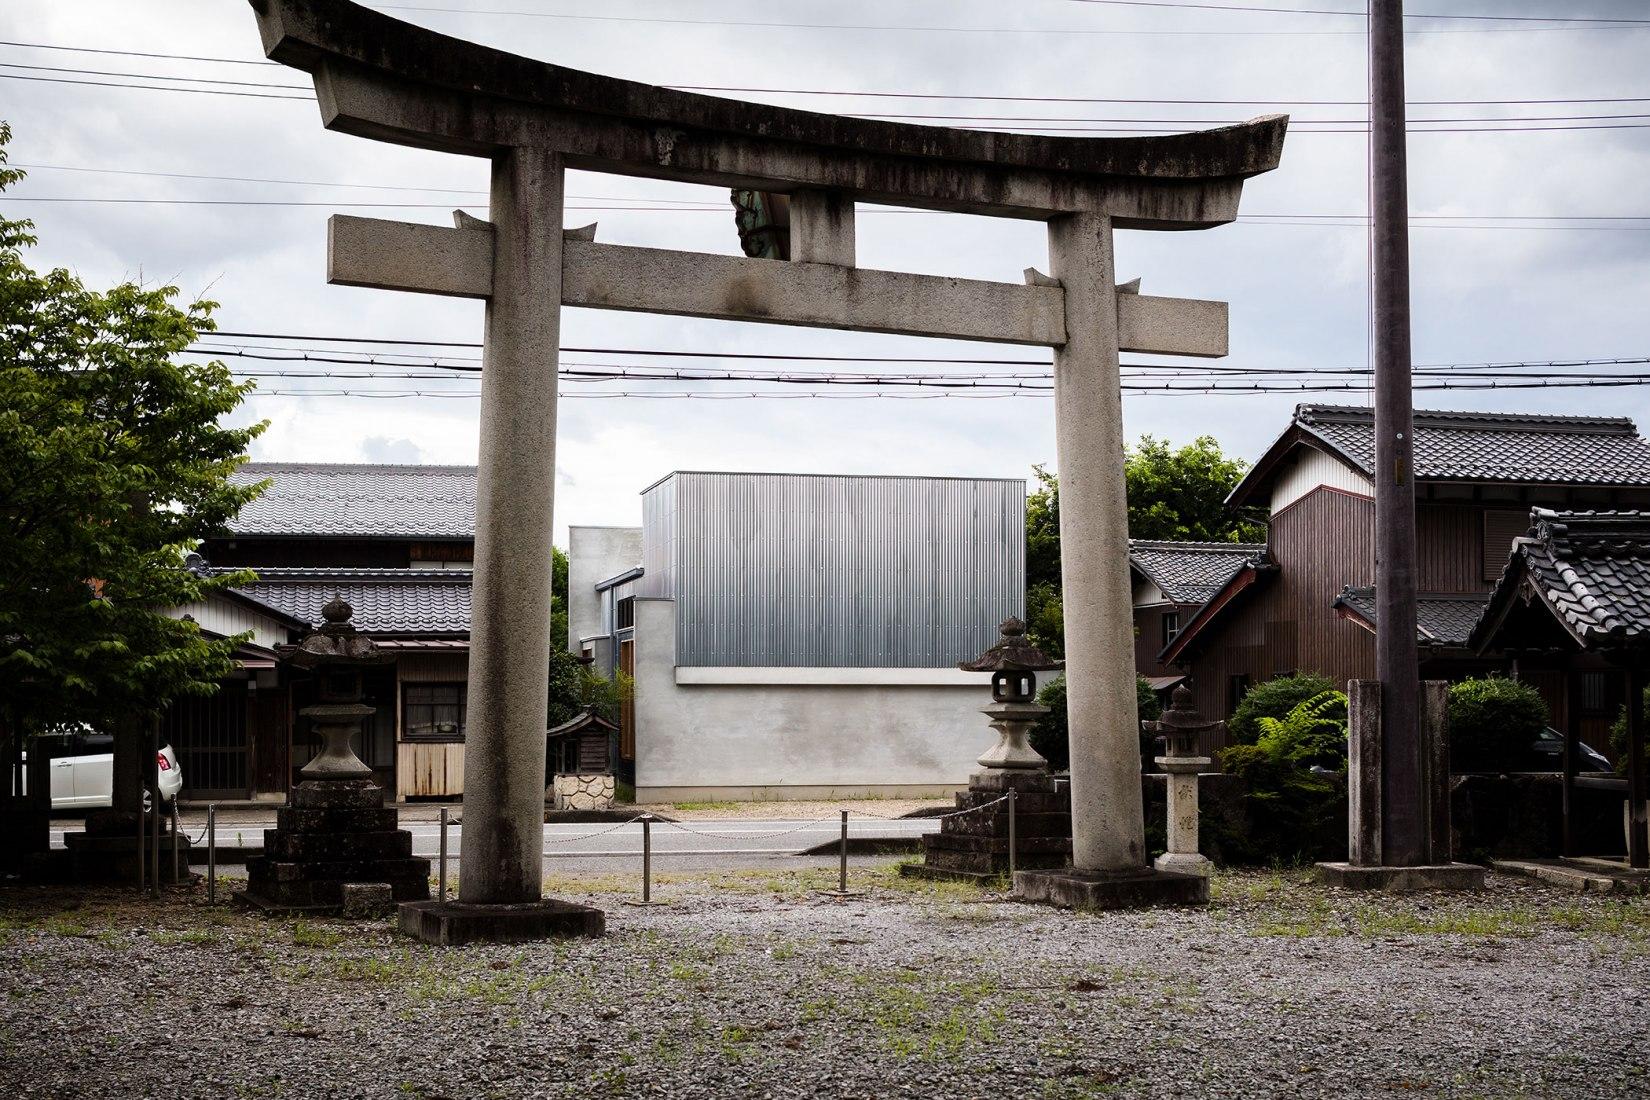 House for a Photographer by FORM/Kouichi Kimura Architects. Photograph © Norihito Yamauchi